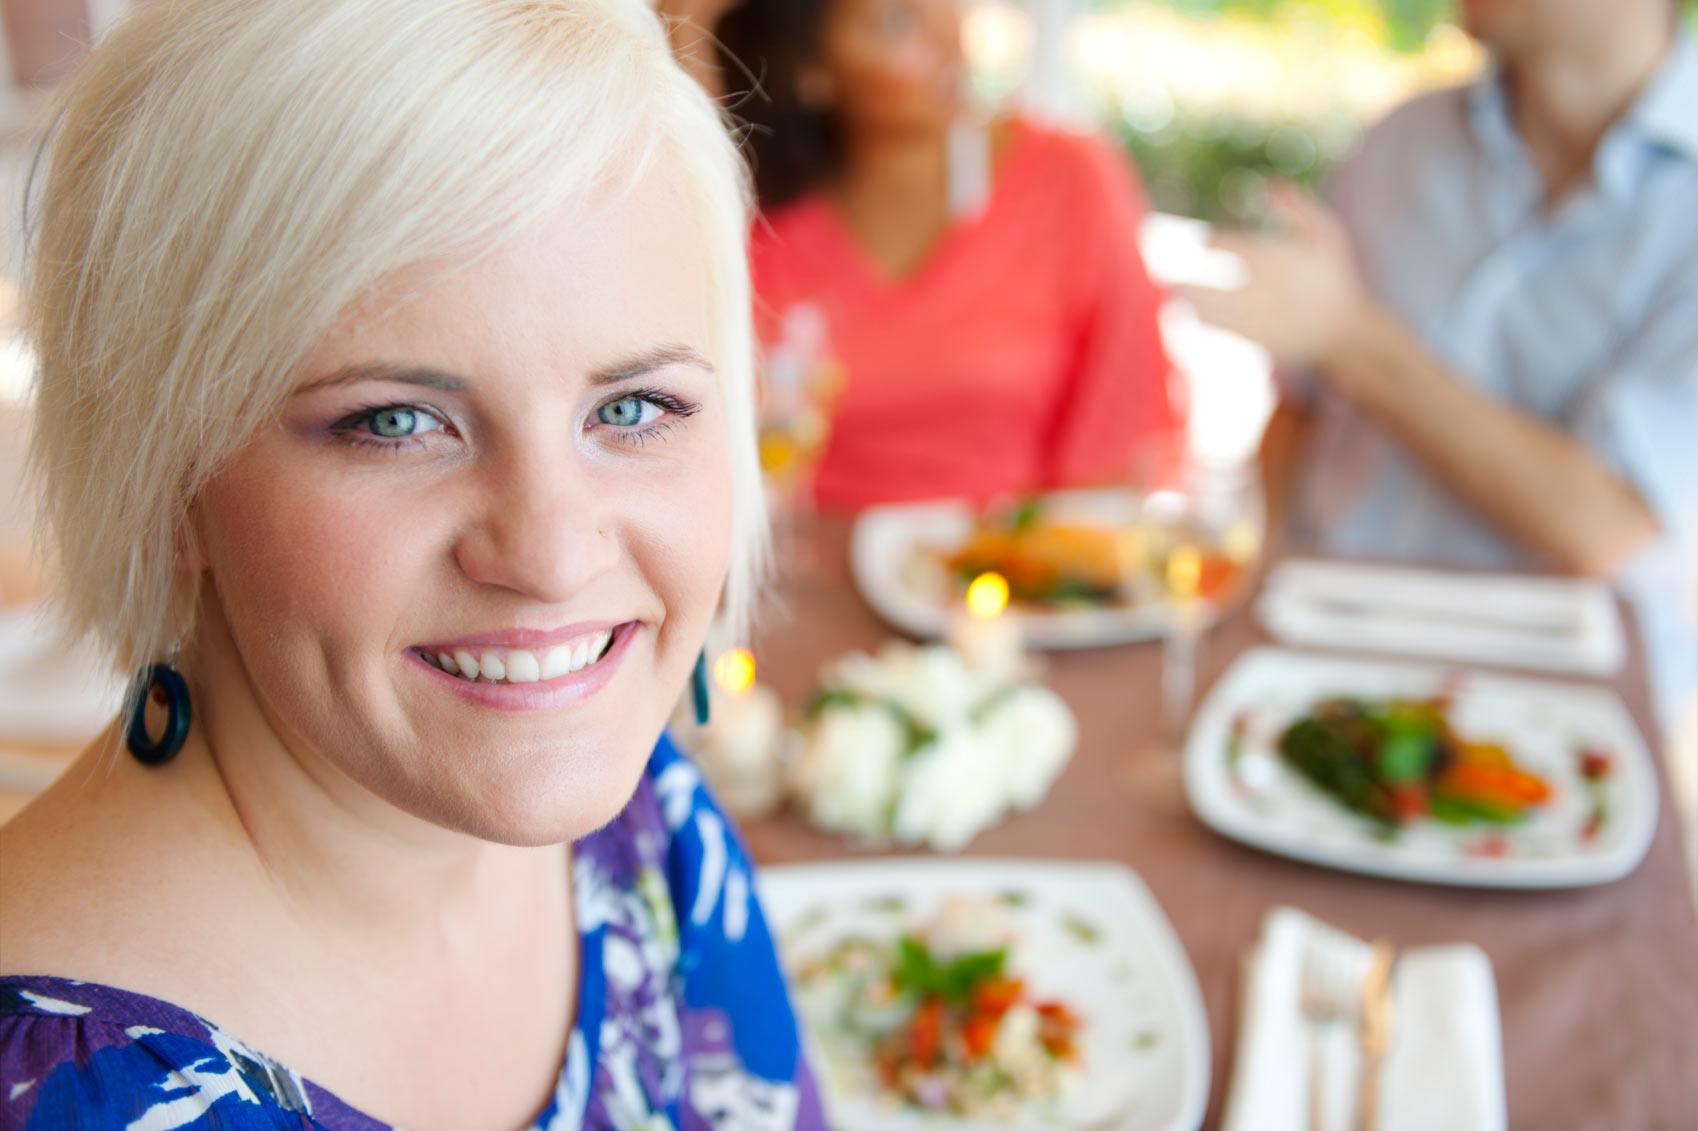 Weight Loss Surgery Benefits: Type II Diabetes